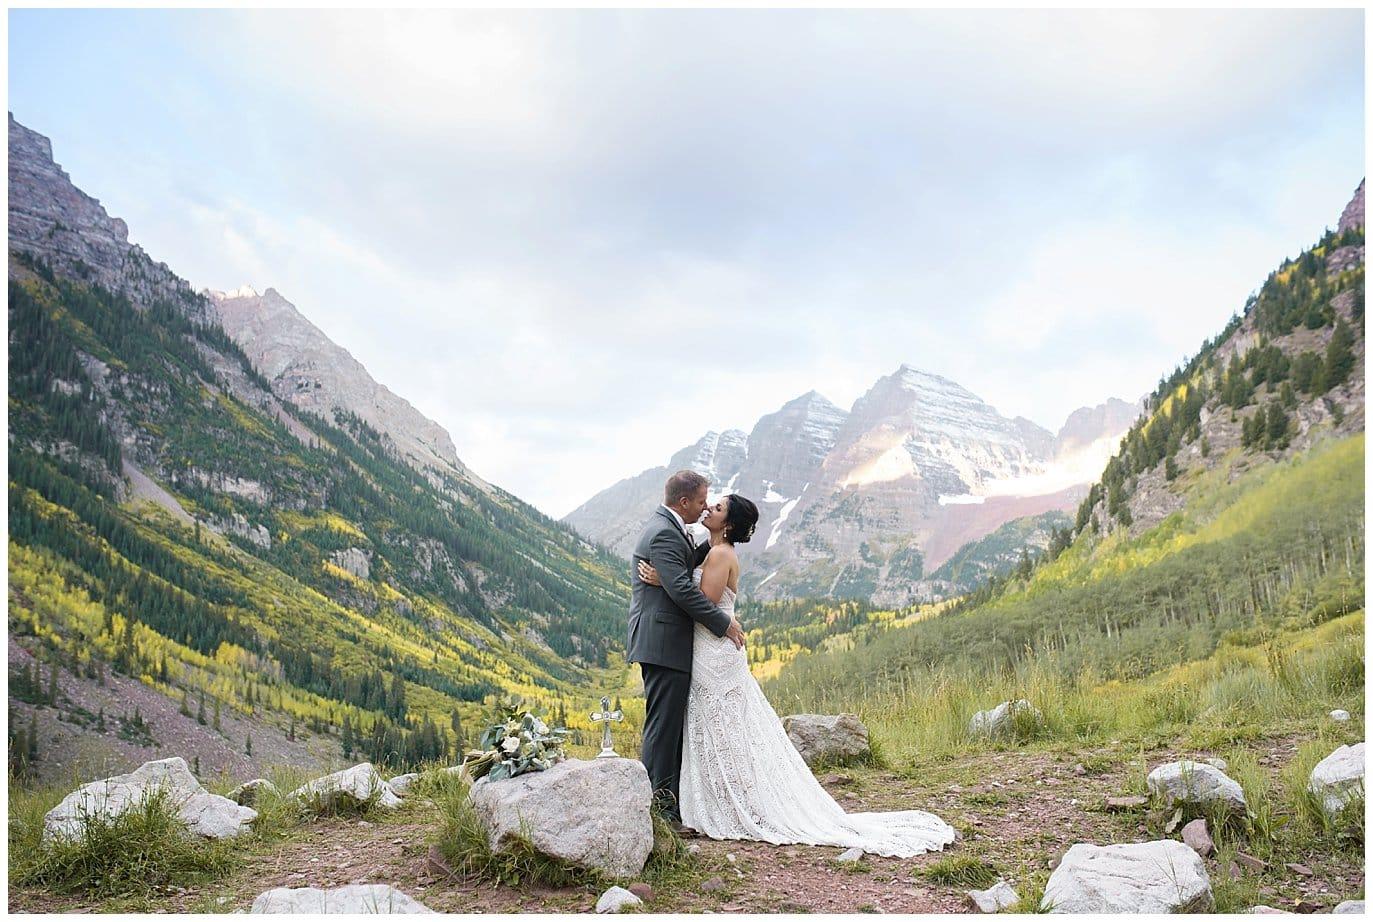 Maroon Bells Aspen Colorado elopement photo